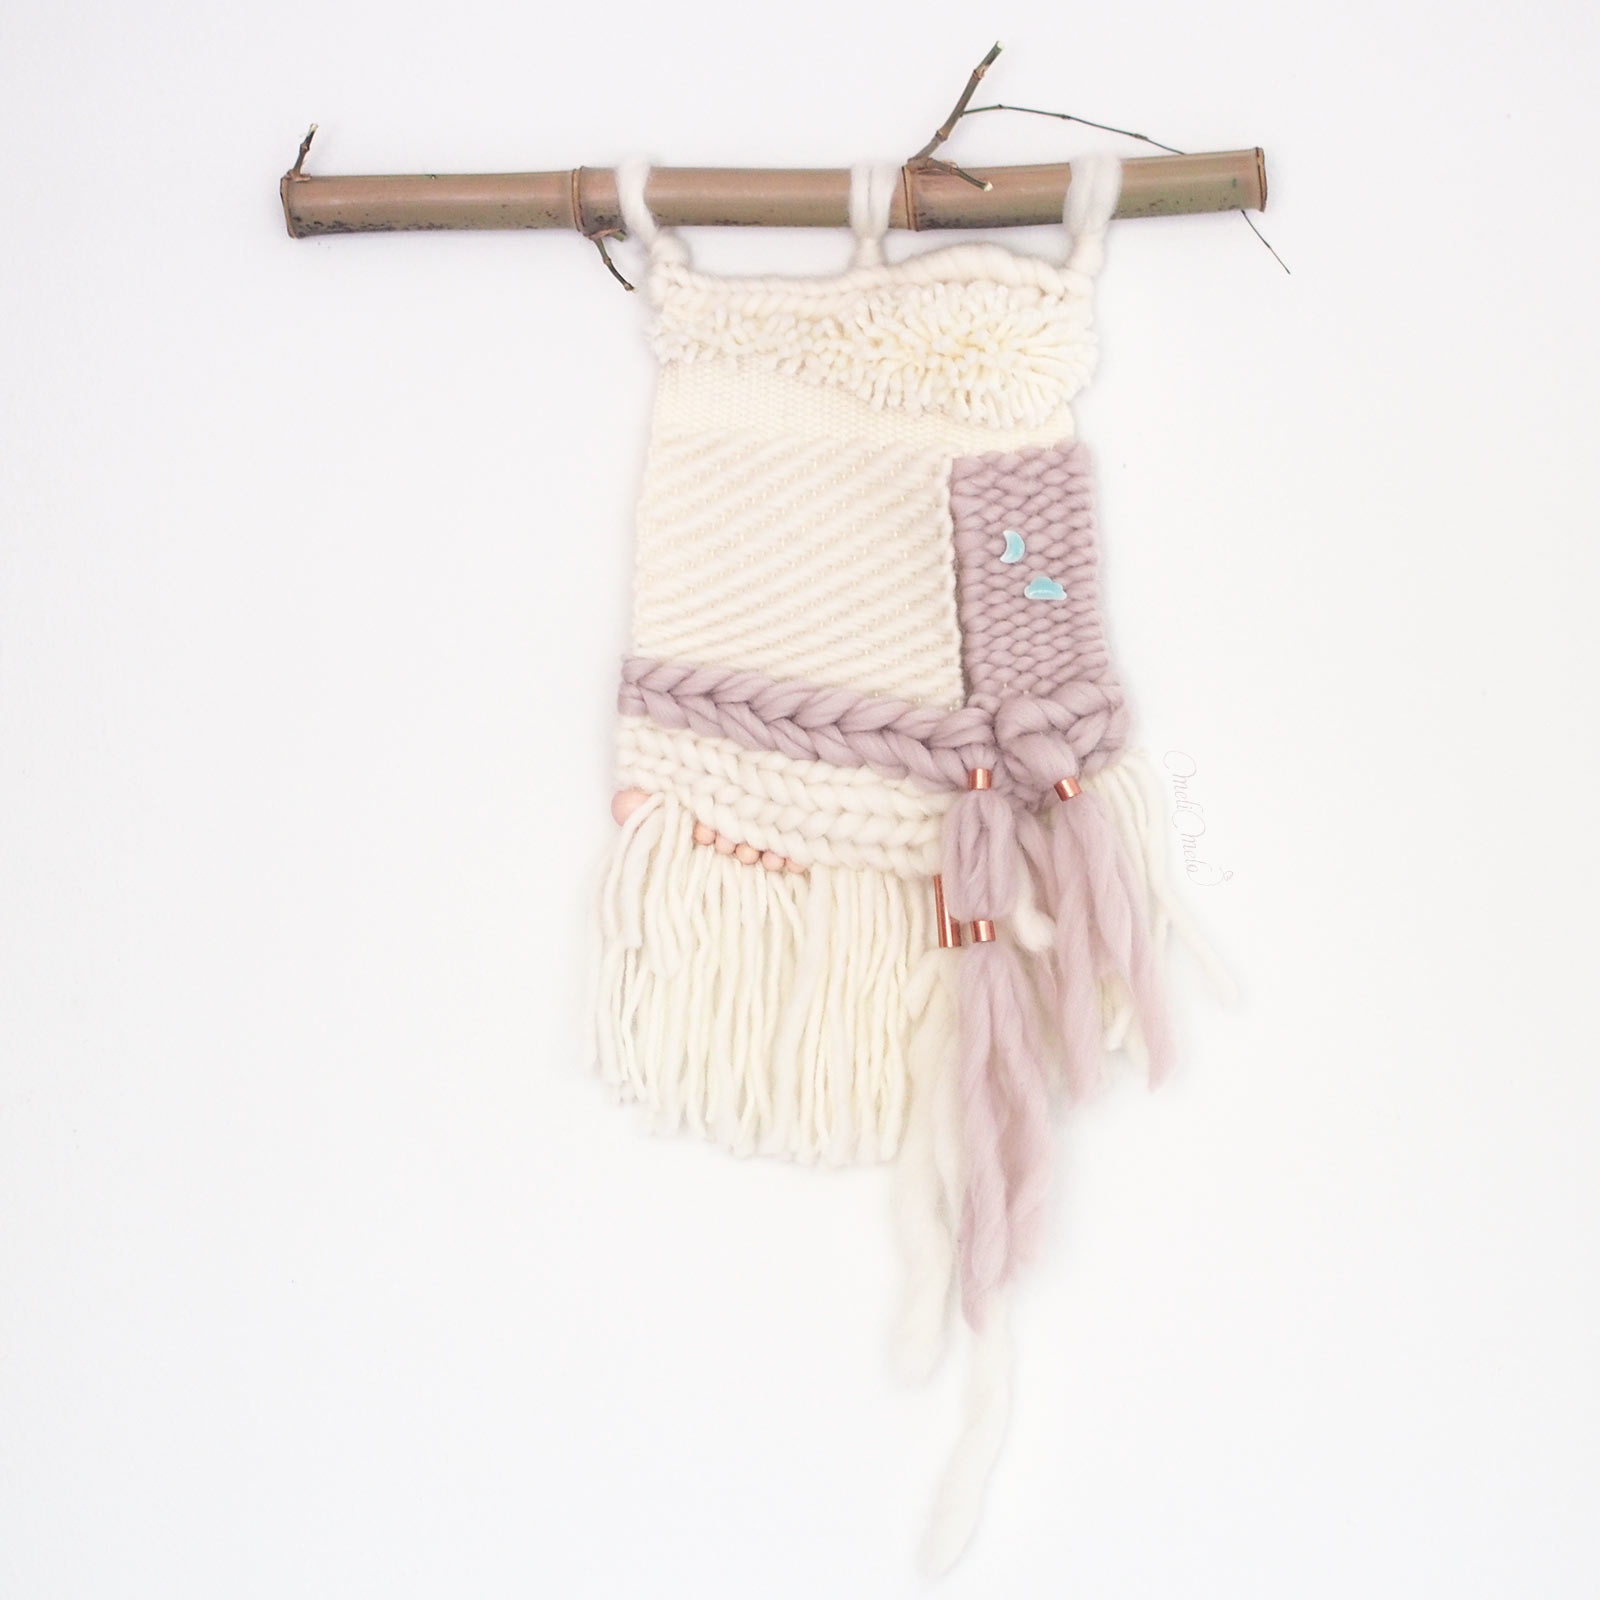 tissage laine cuivre lune nuage mural wool weareknitters laboutiquedemelimelo